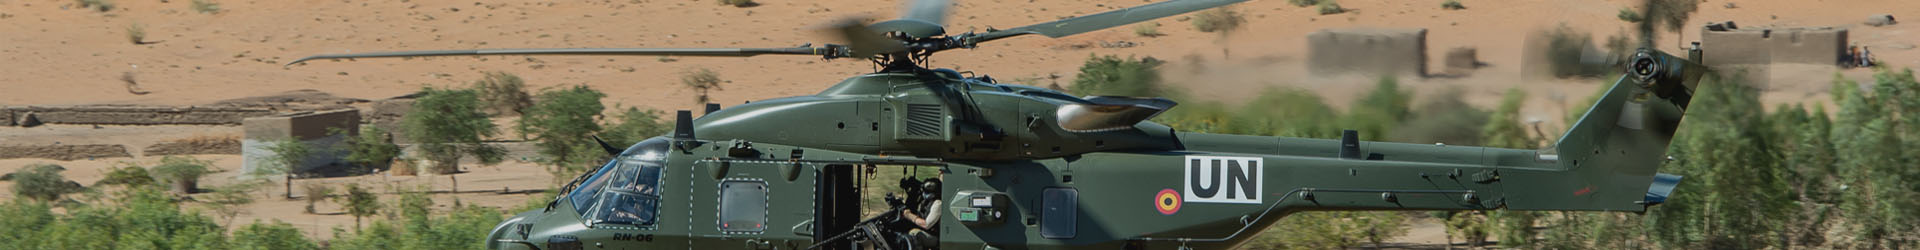 Header wings - Belgian Air Force Association